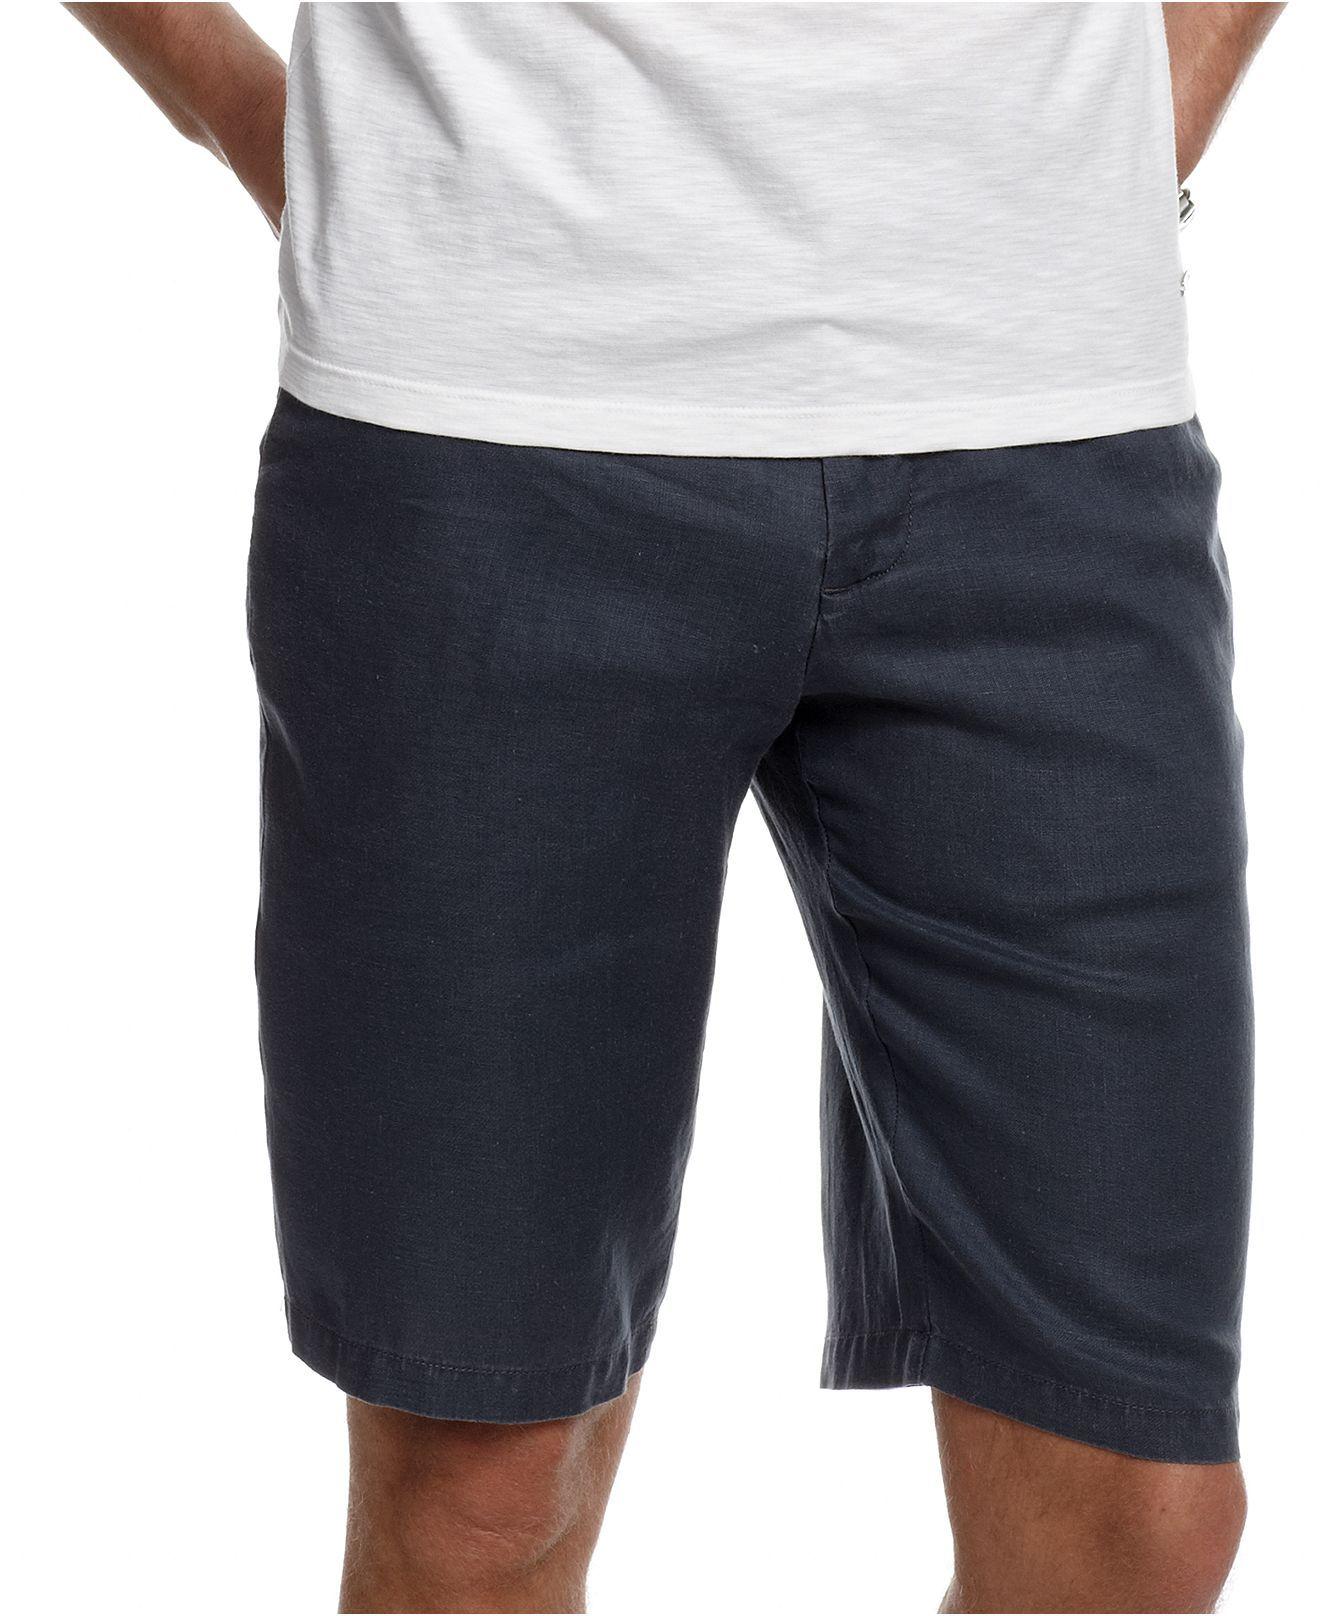 Calvin Klein Shorts, Linen Shorts - Mens Shorts - Macy's | Shorts ...